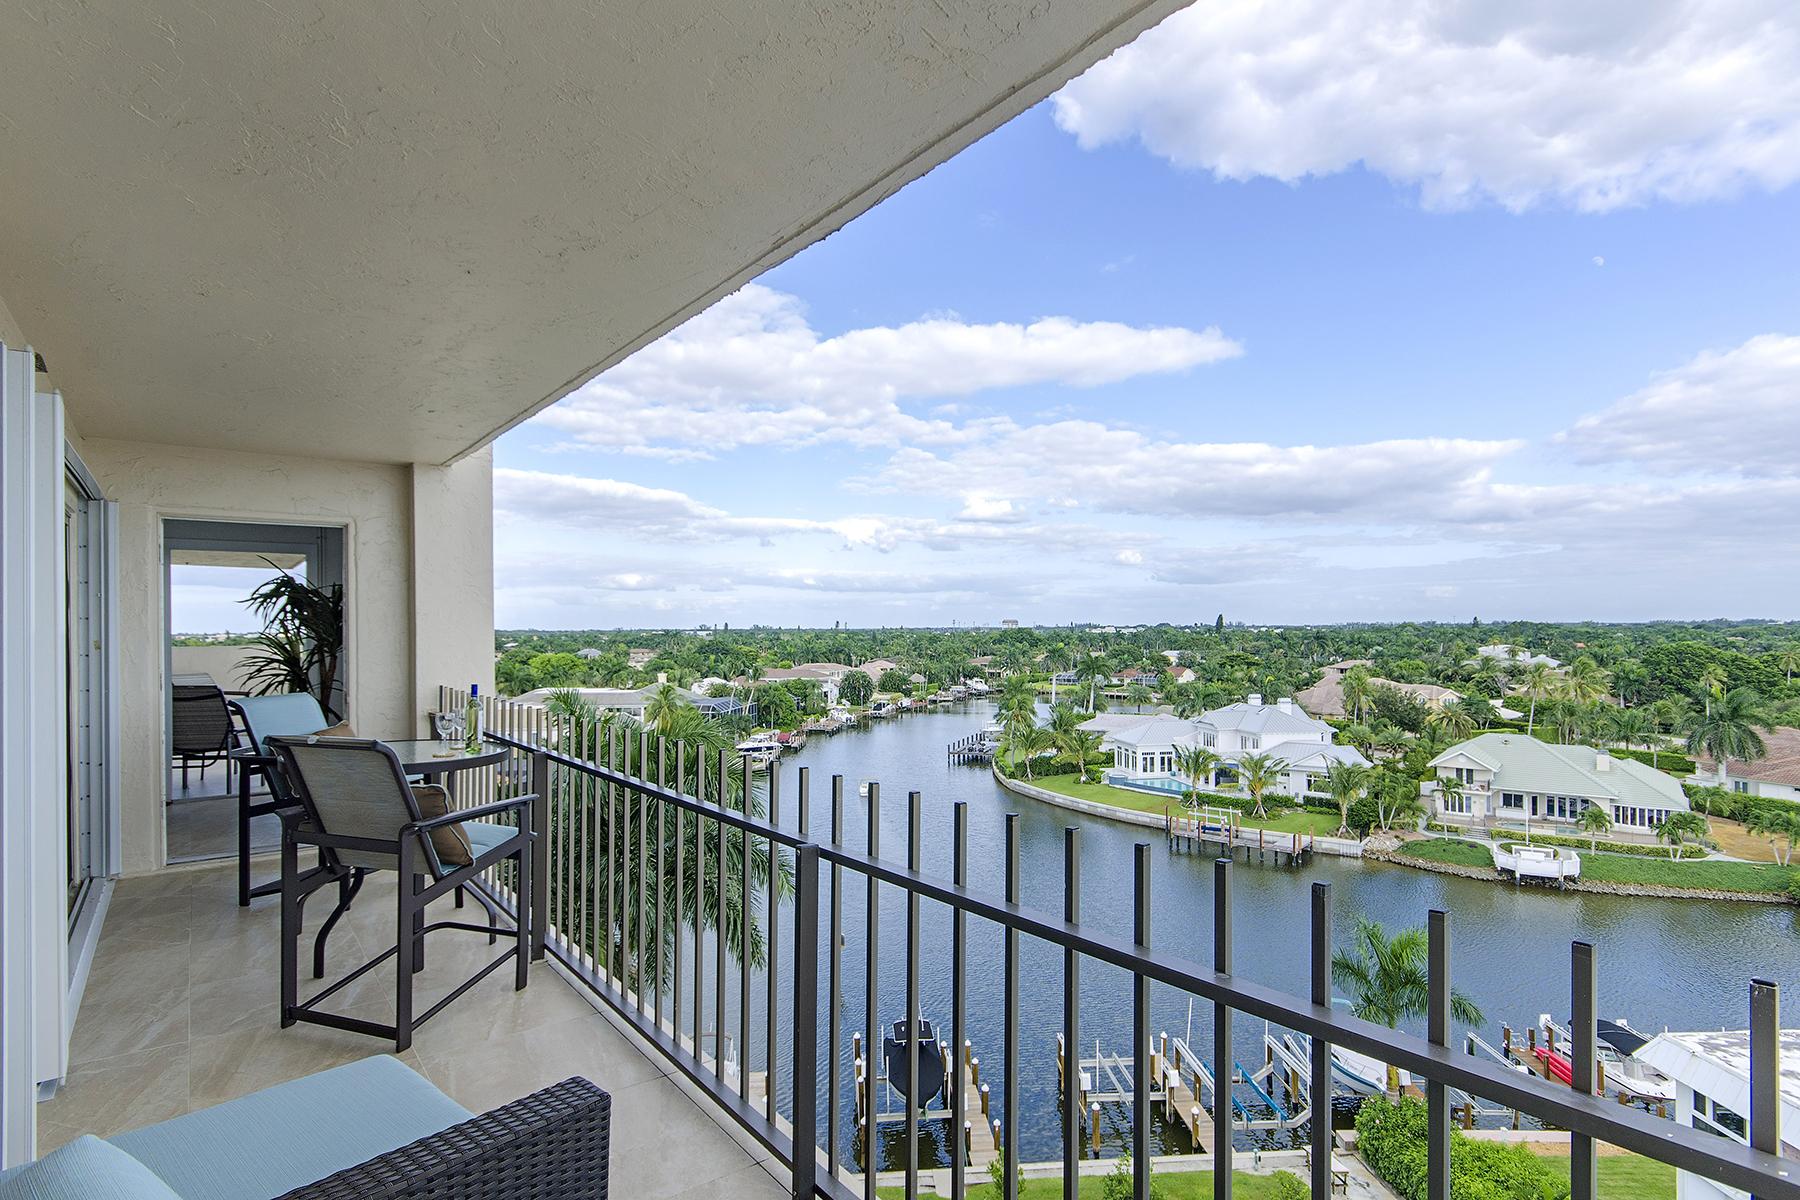 Condomínio para Venda às 2150 Gulf Shore Blvd N, Naples, FL 34102 2150 Gulf Shore Blvd N PS Naples, Florida, 34102 Estados Unidos